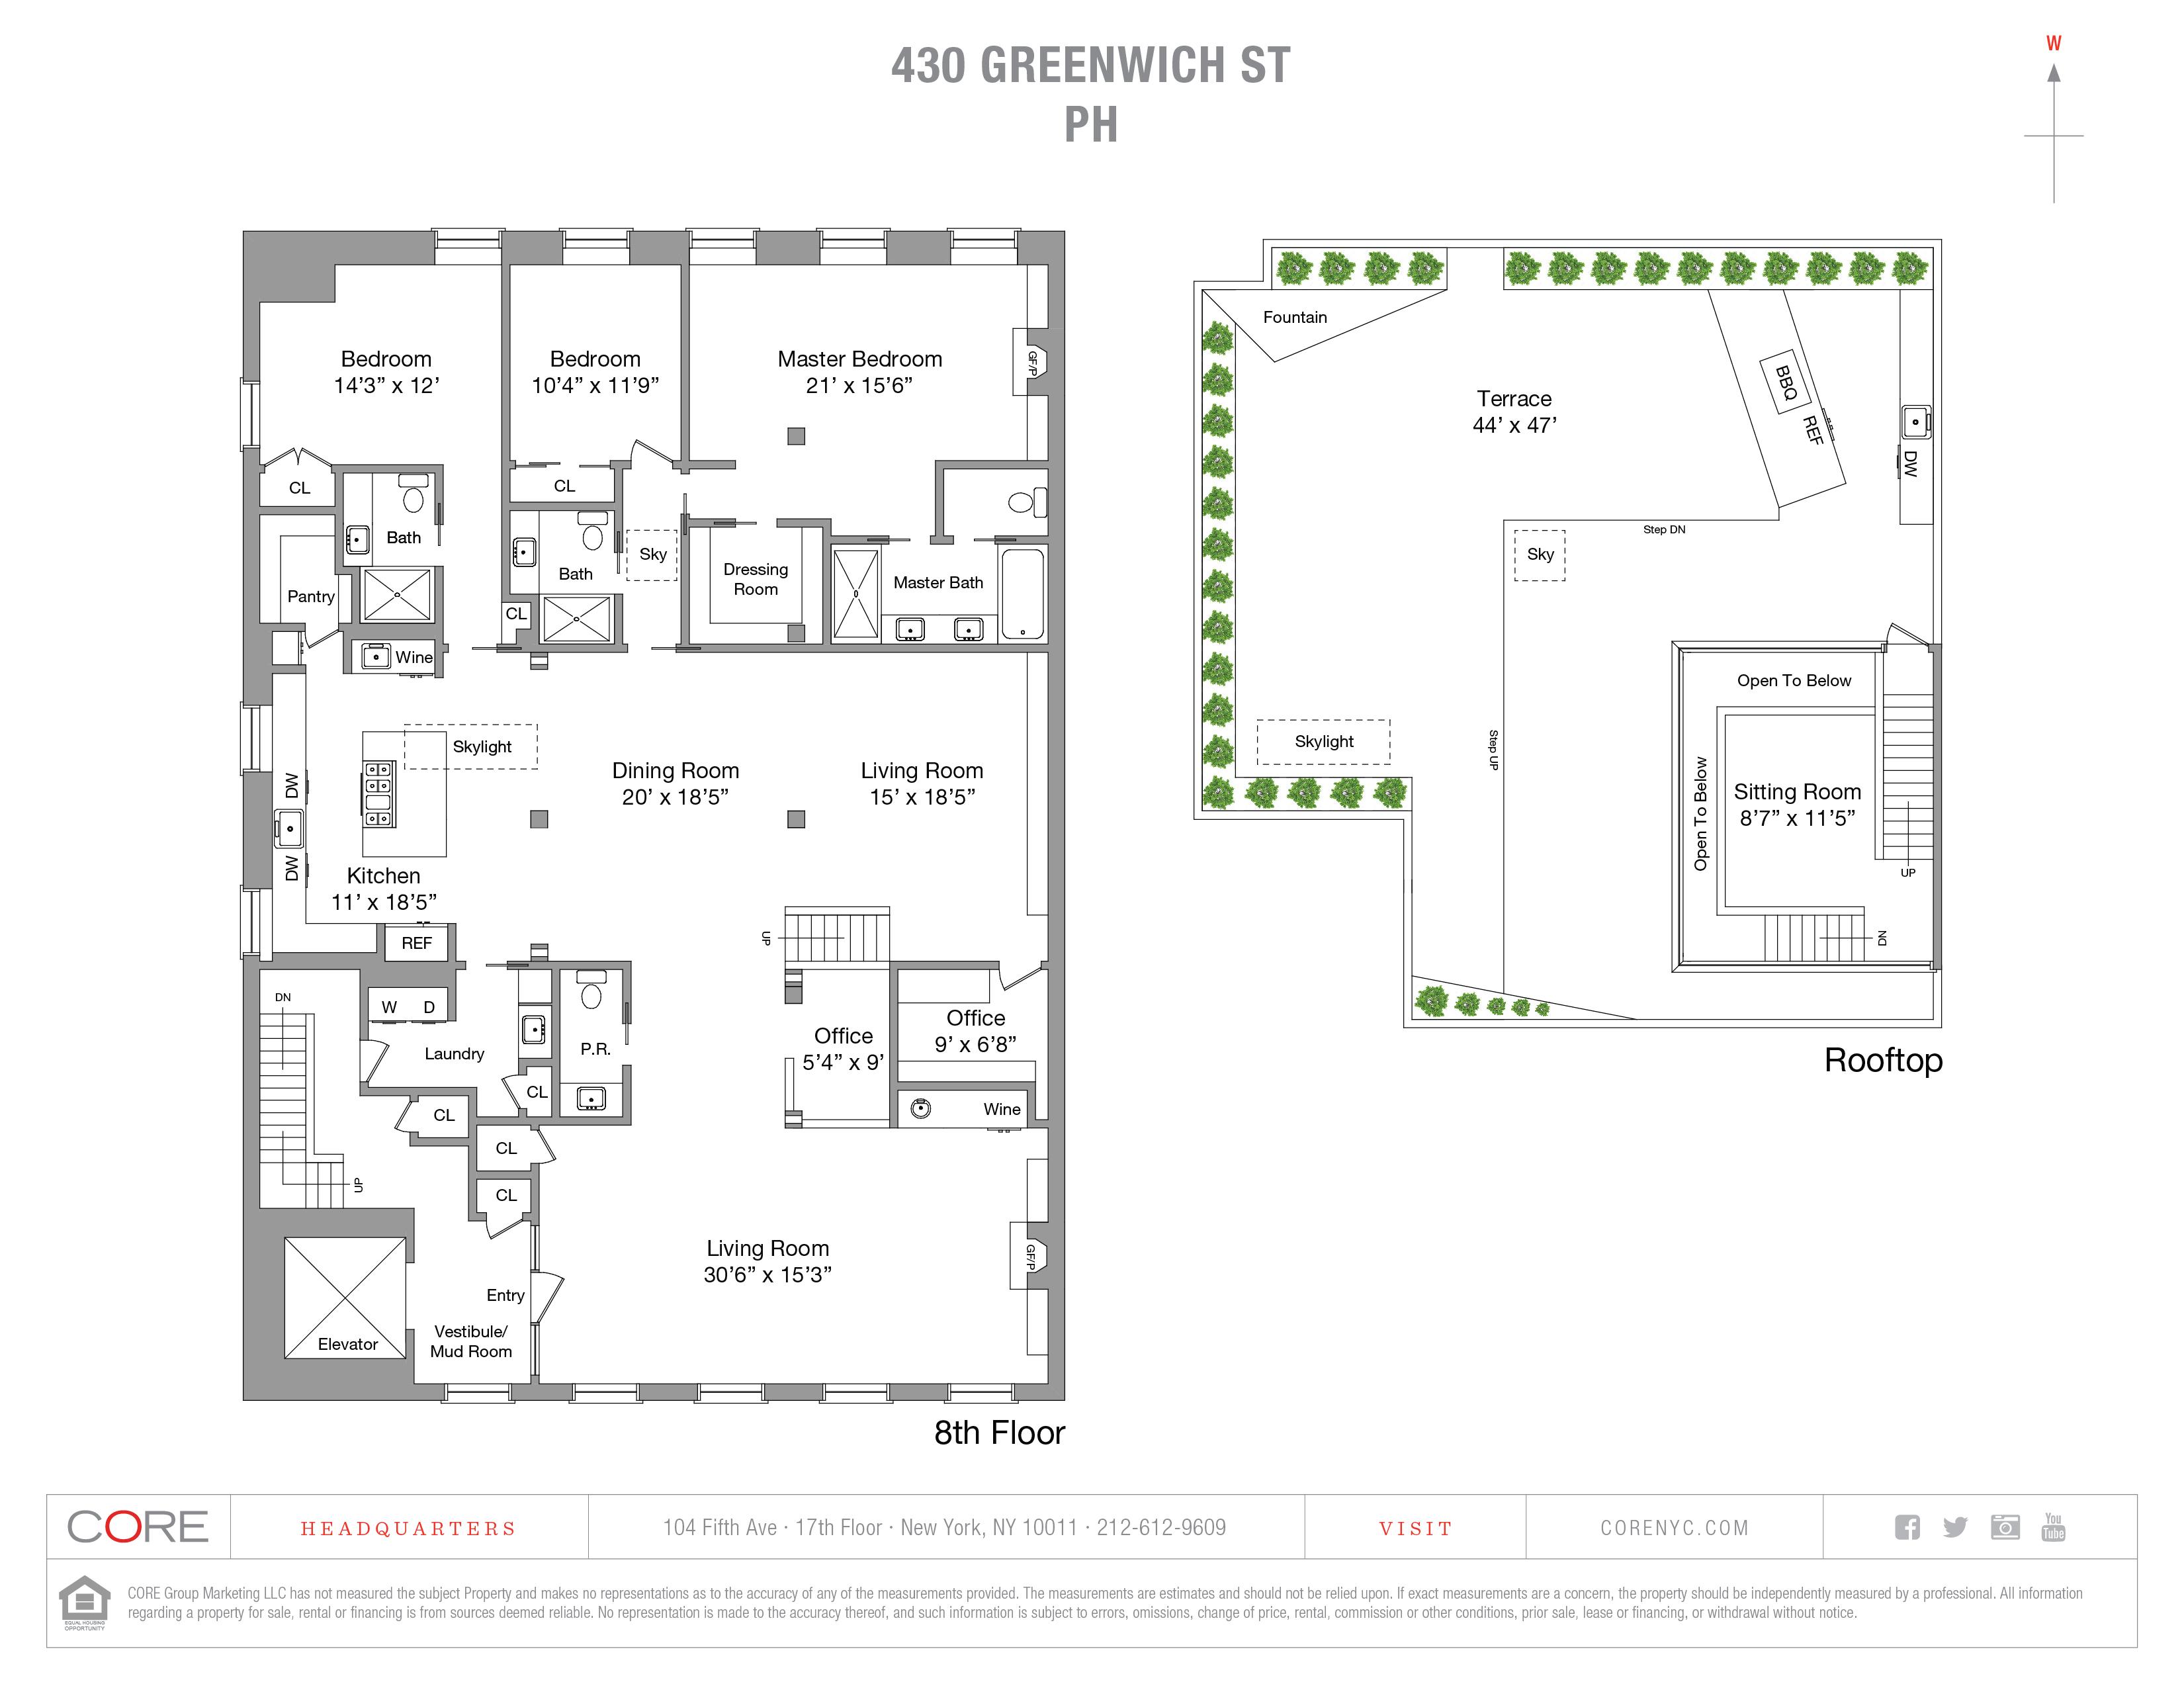 430 Greenwich St. PH, New York, NY 10013